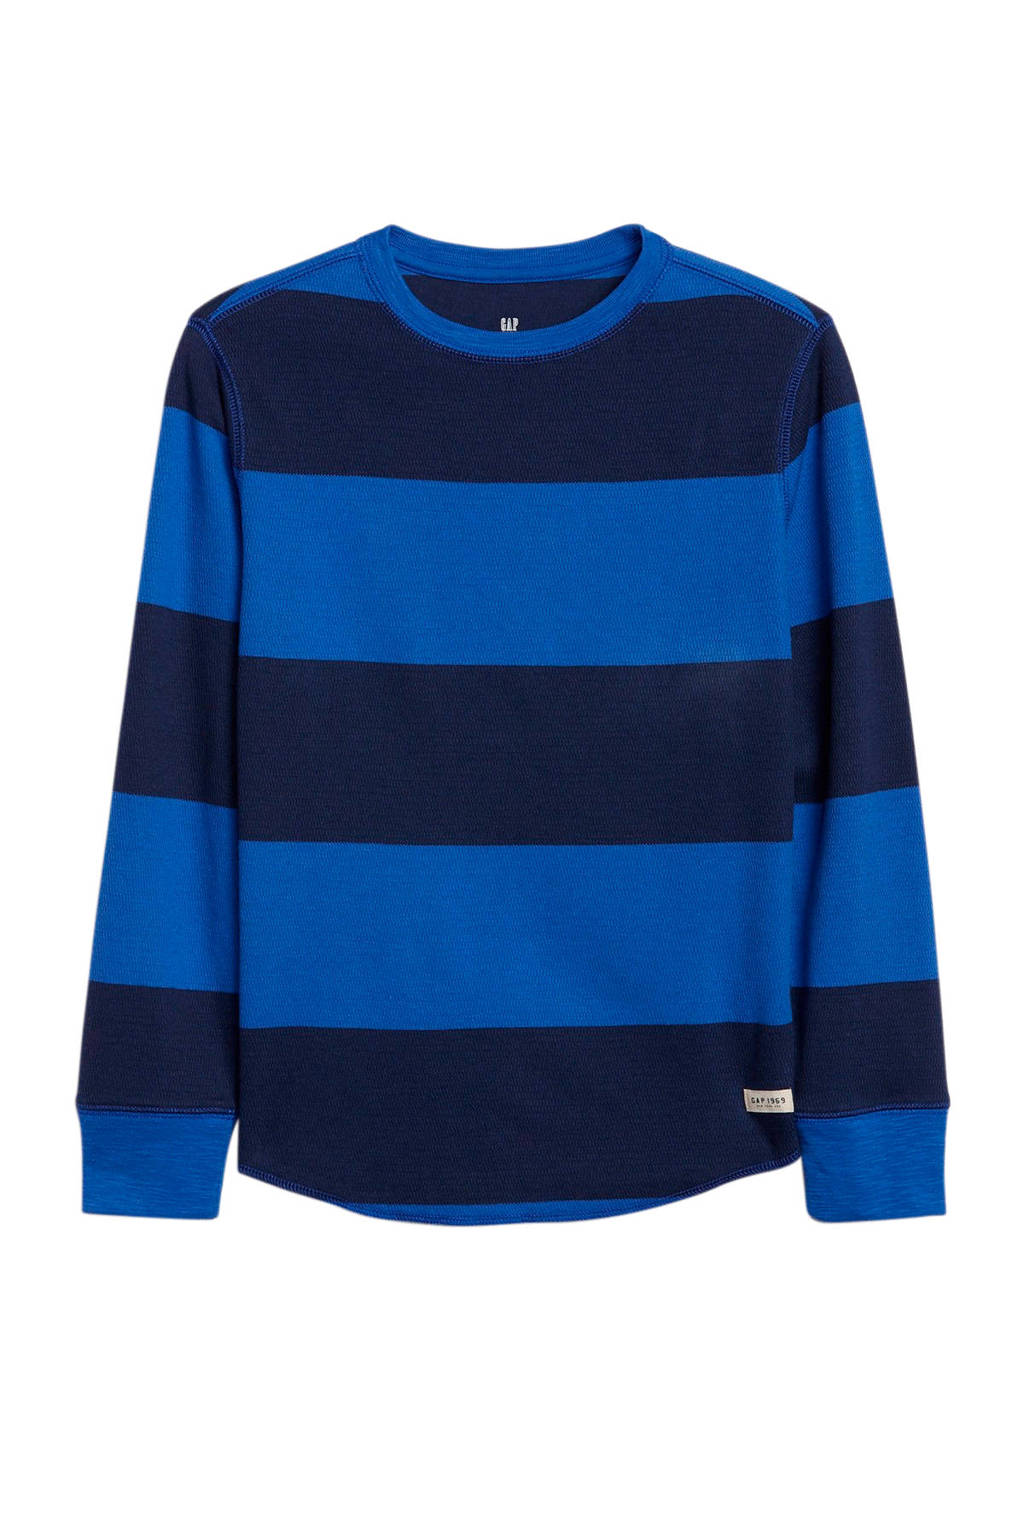 GAP gestreepte longsleeve blauw/donkerblauw, Blauw/donkerblauw